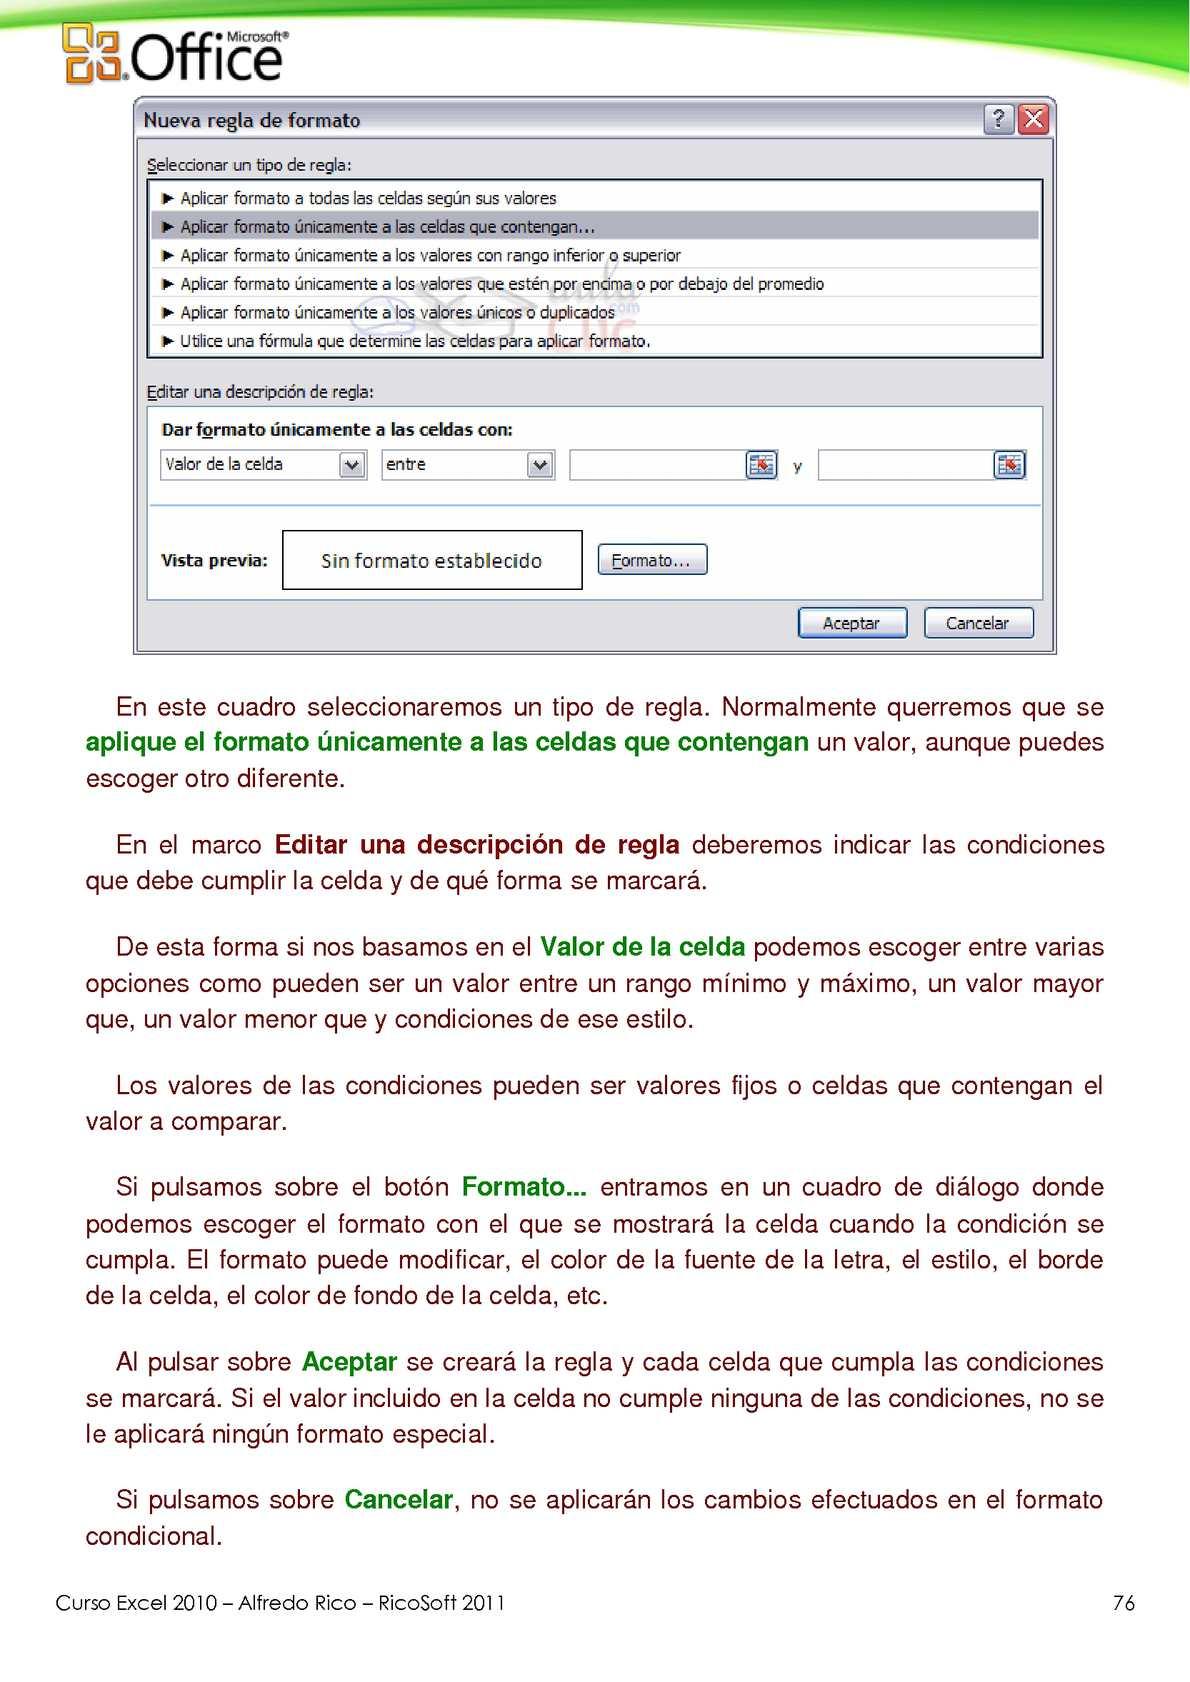 Curso de Microsoft Excel 2010 - CALAMEO Downloader